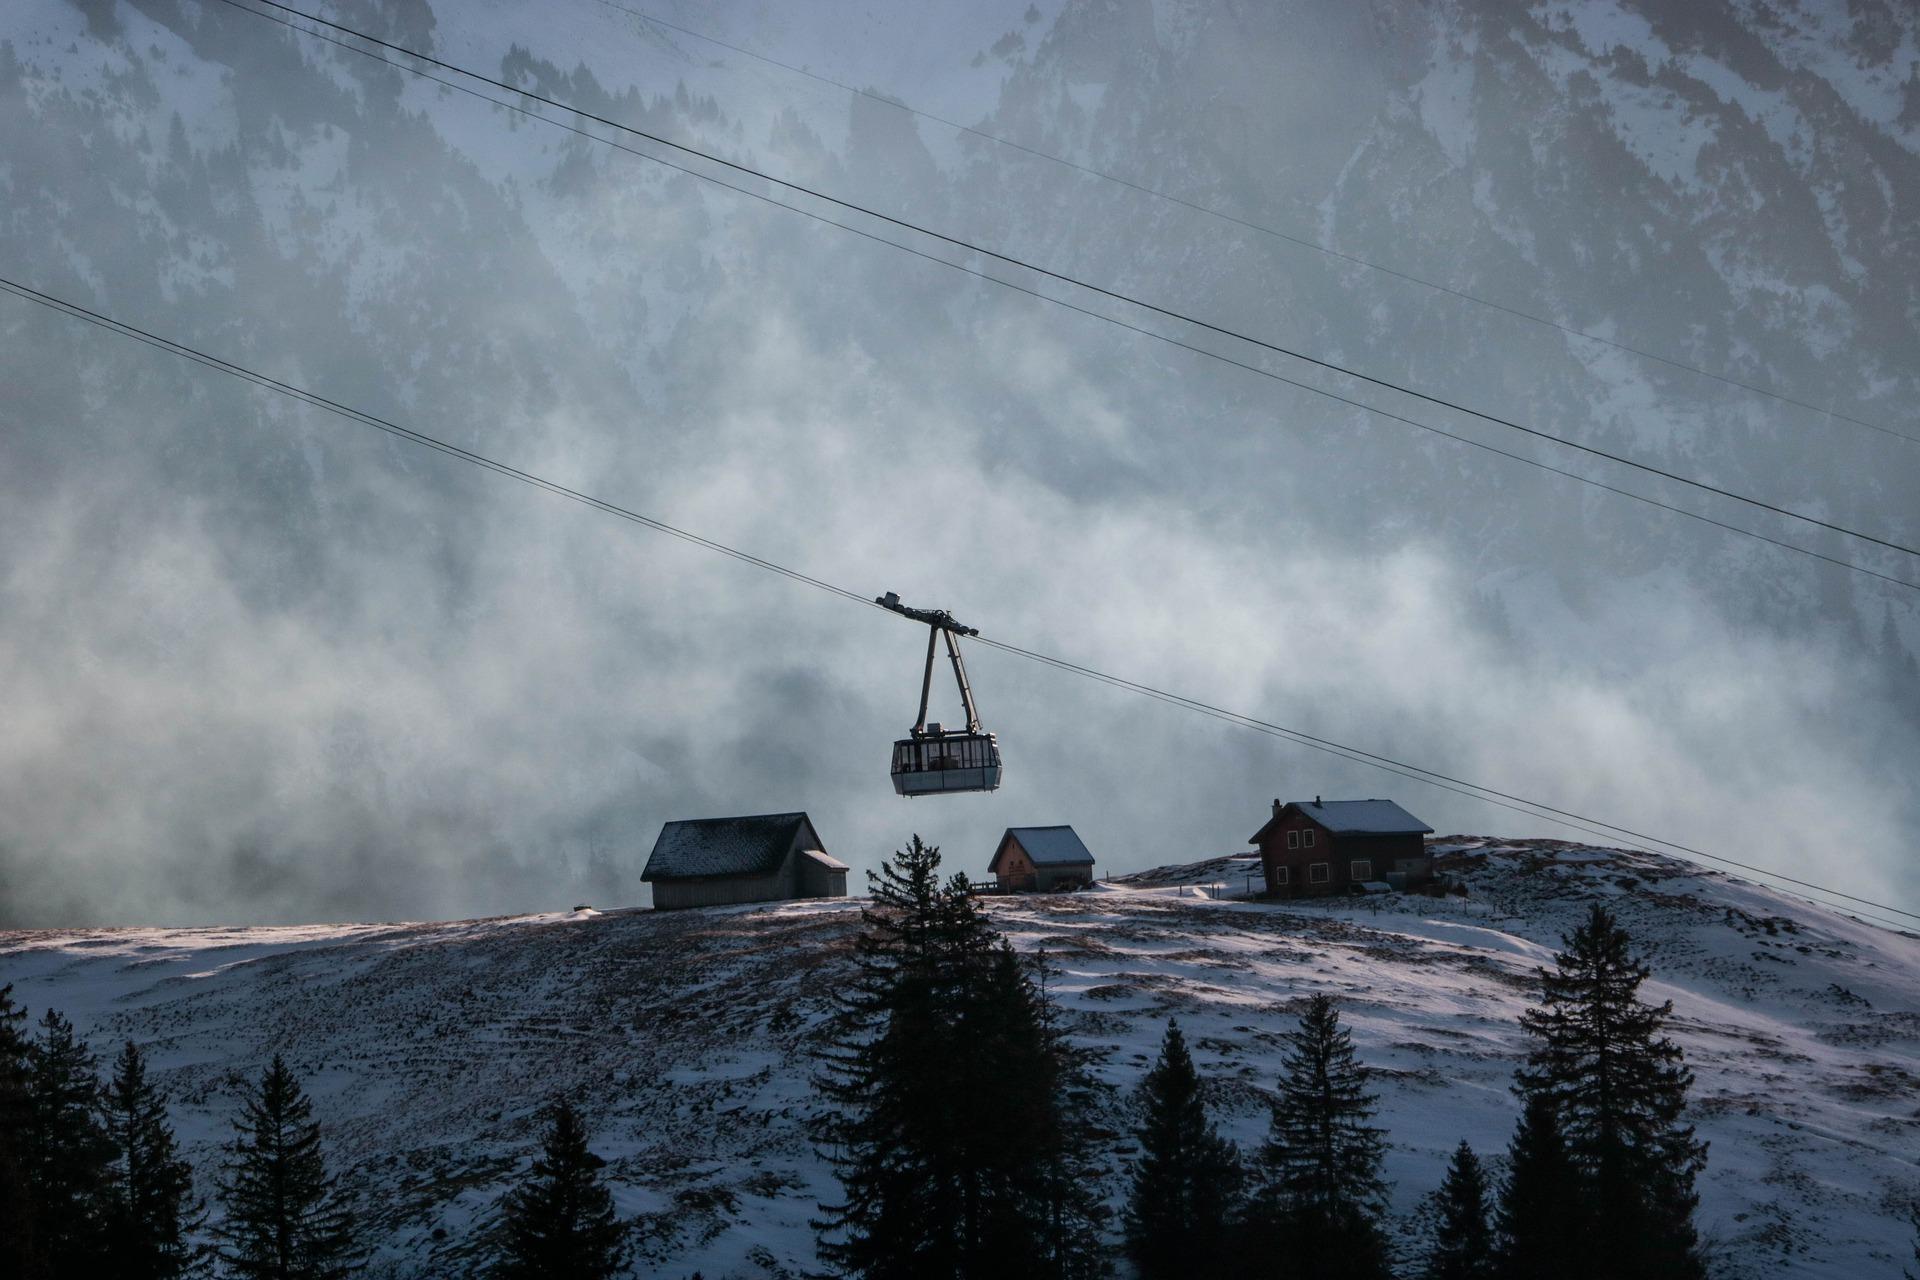 Picturesque Ski Vacation